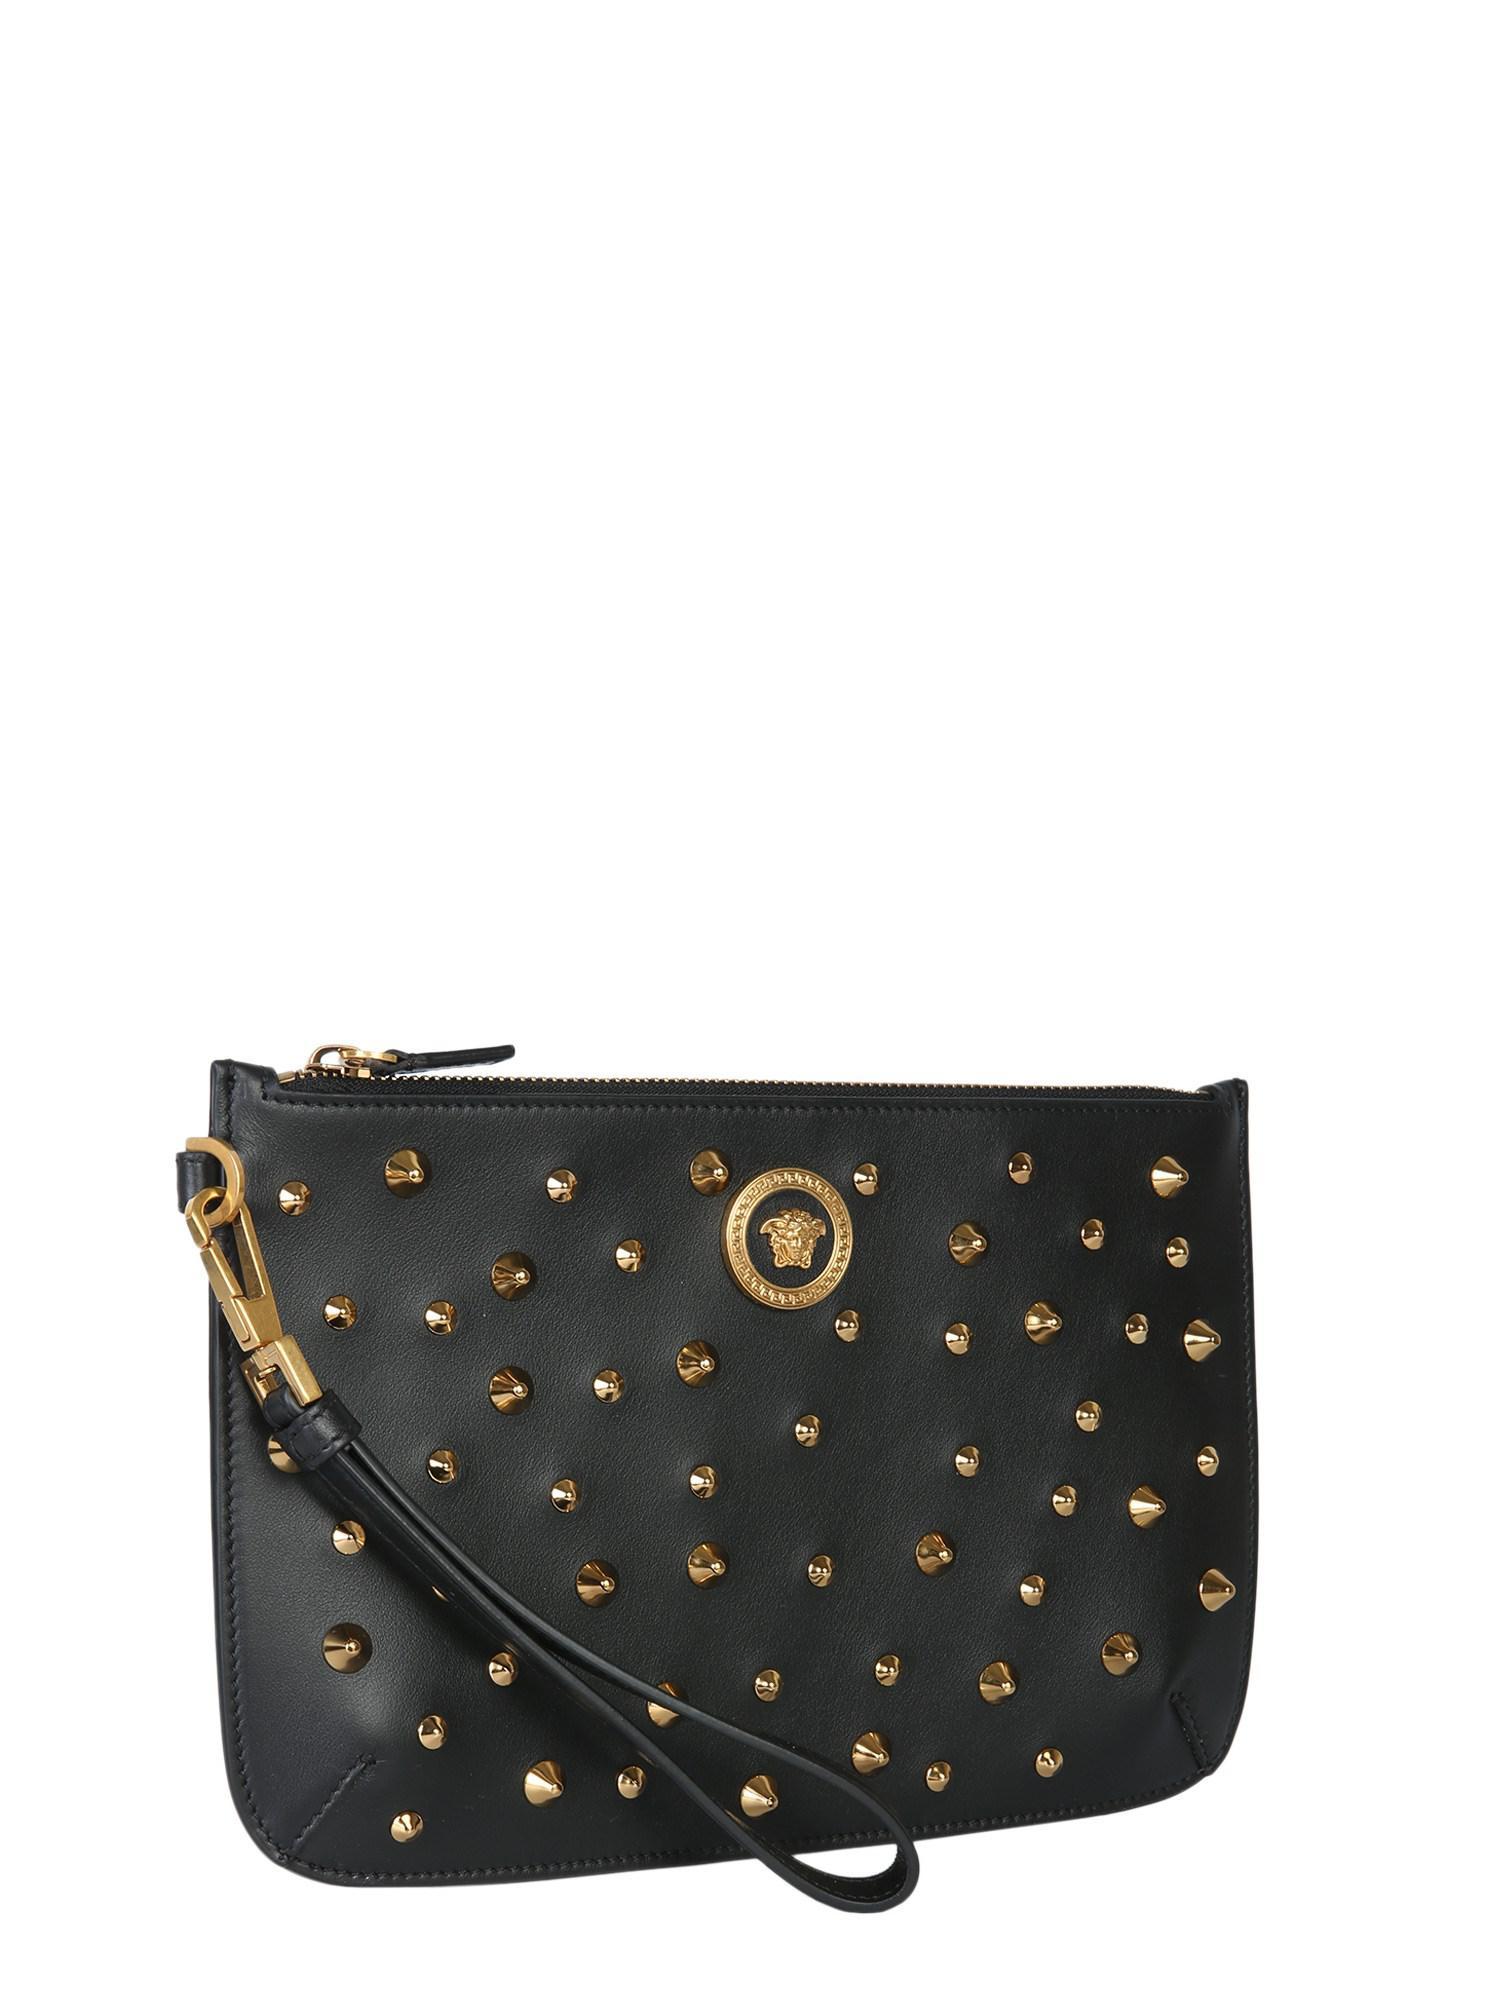 94a72c1b35 Versace Small Medusa Clutch Bag in Black - Save 16.139240506329116 ...